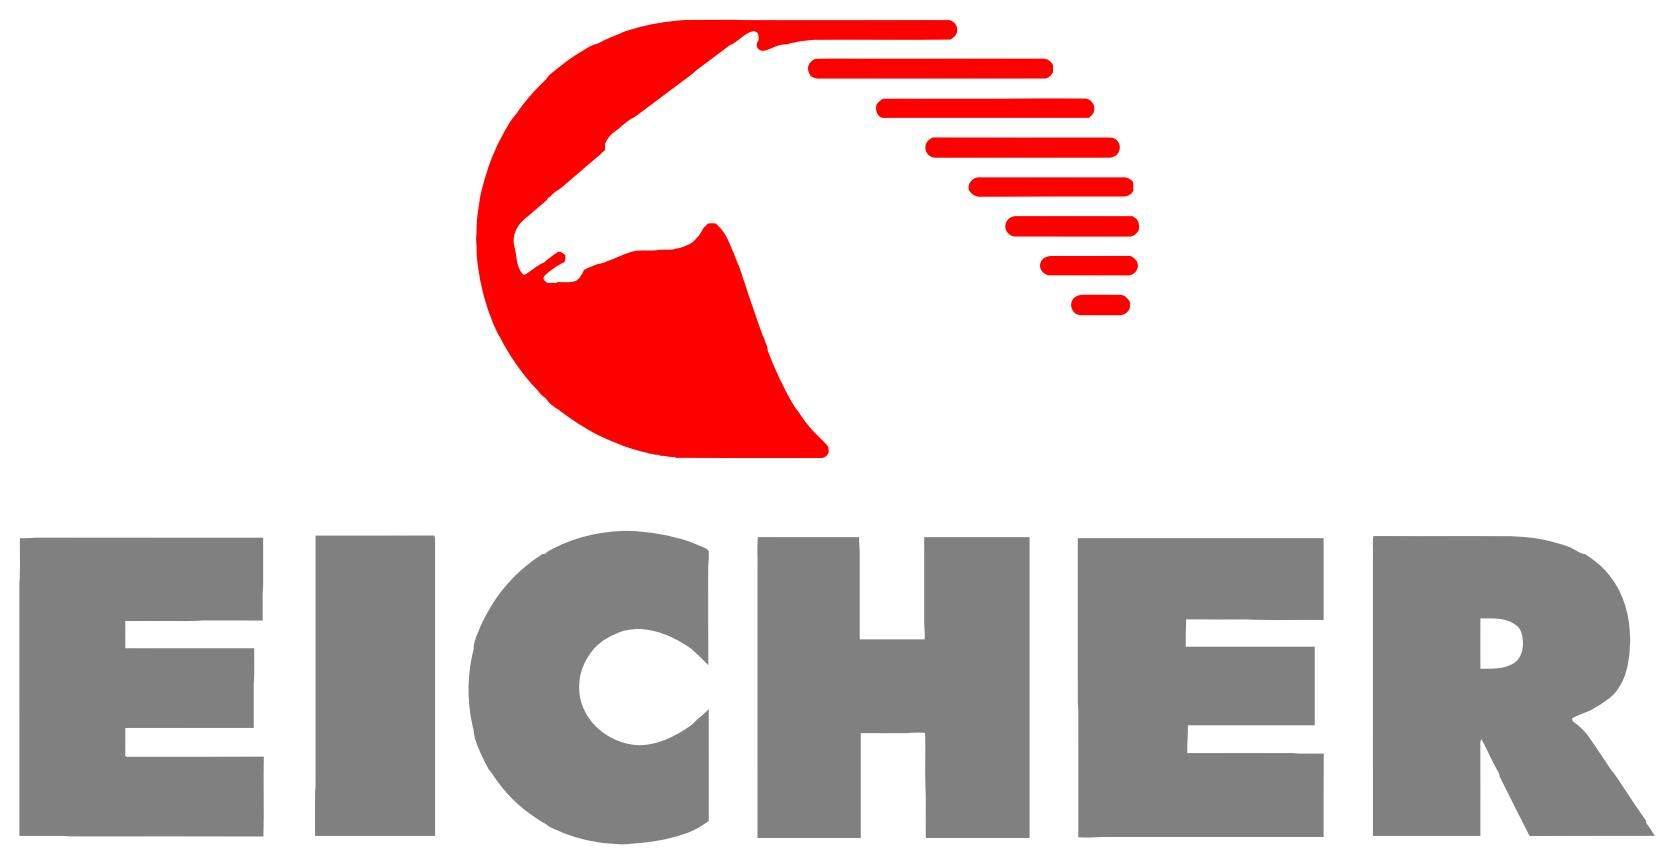 eicher motors logo eps pdf car and motorcycle logos pinterest rh pinterest com truck logos images truck logos images